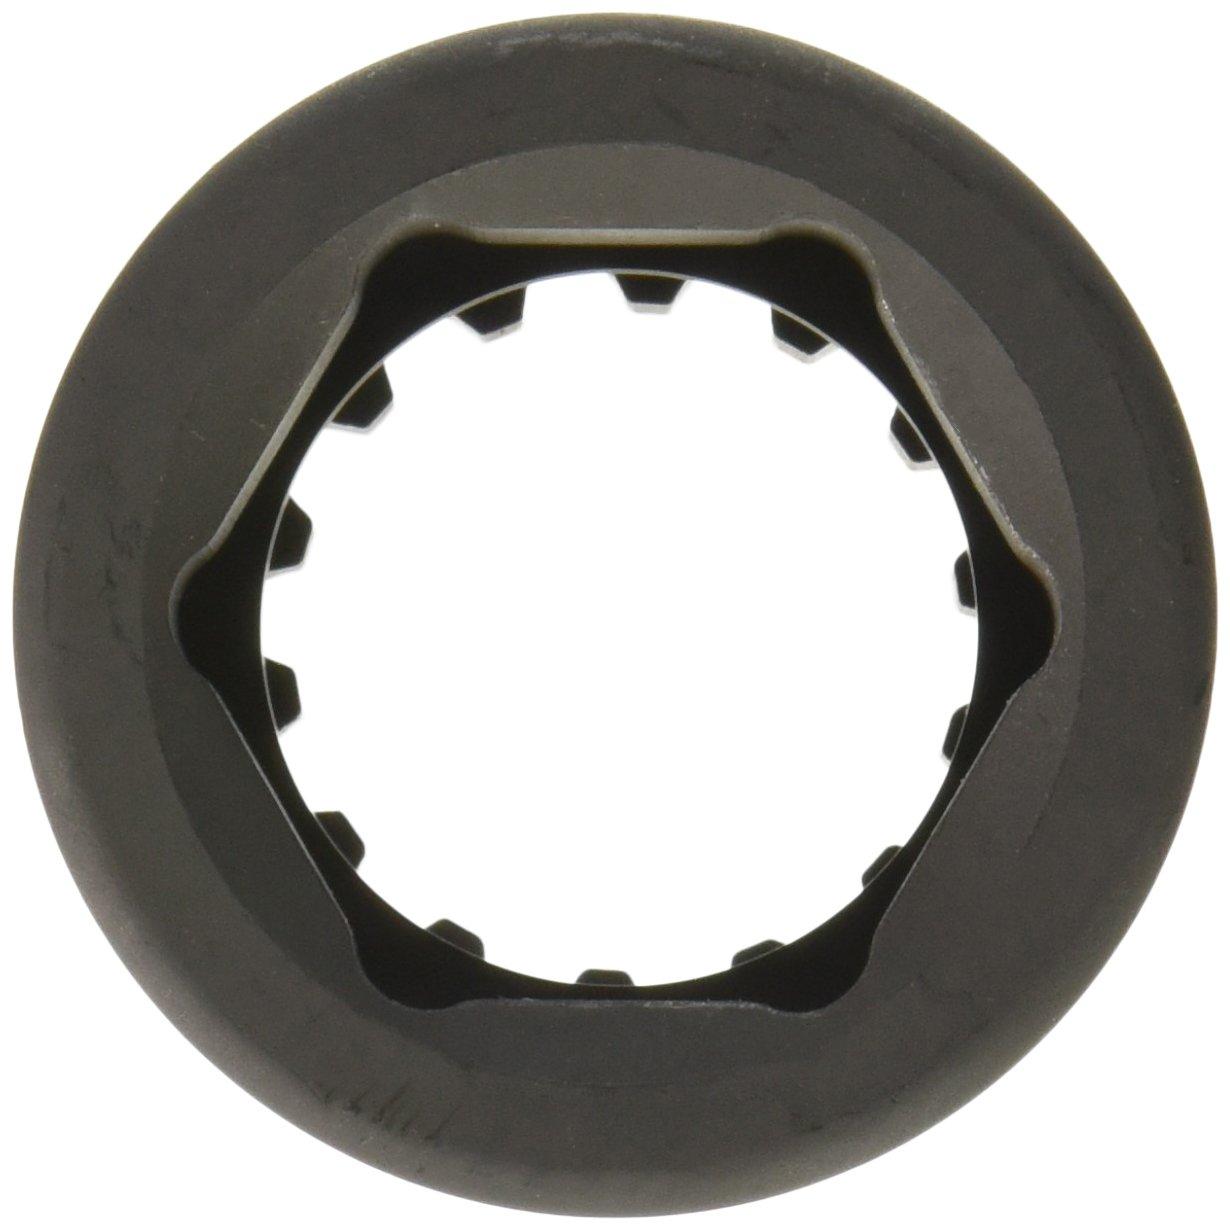 Sunex 5538M #5 Spline Drive 38mm Impact Socket Sunex International